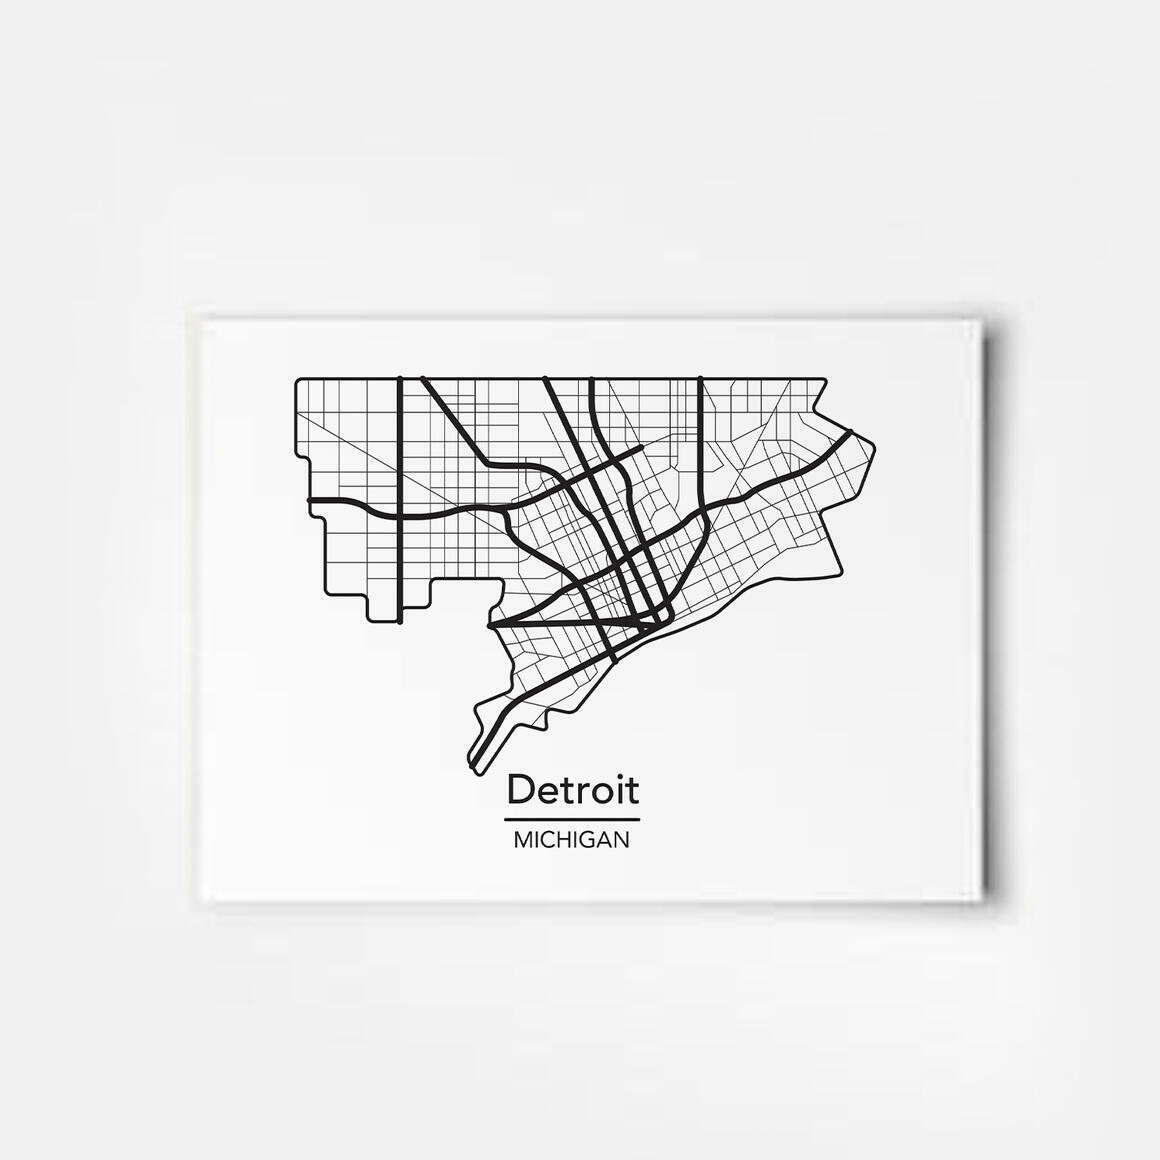 Detroit, Michigan City Map Print   Trada Marketplace